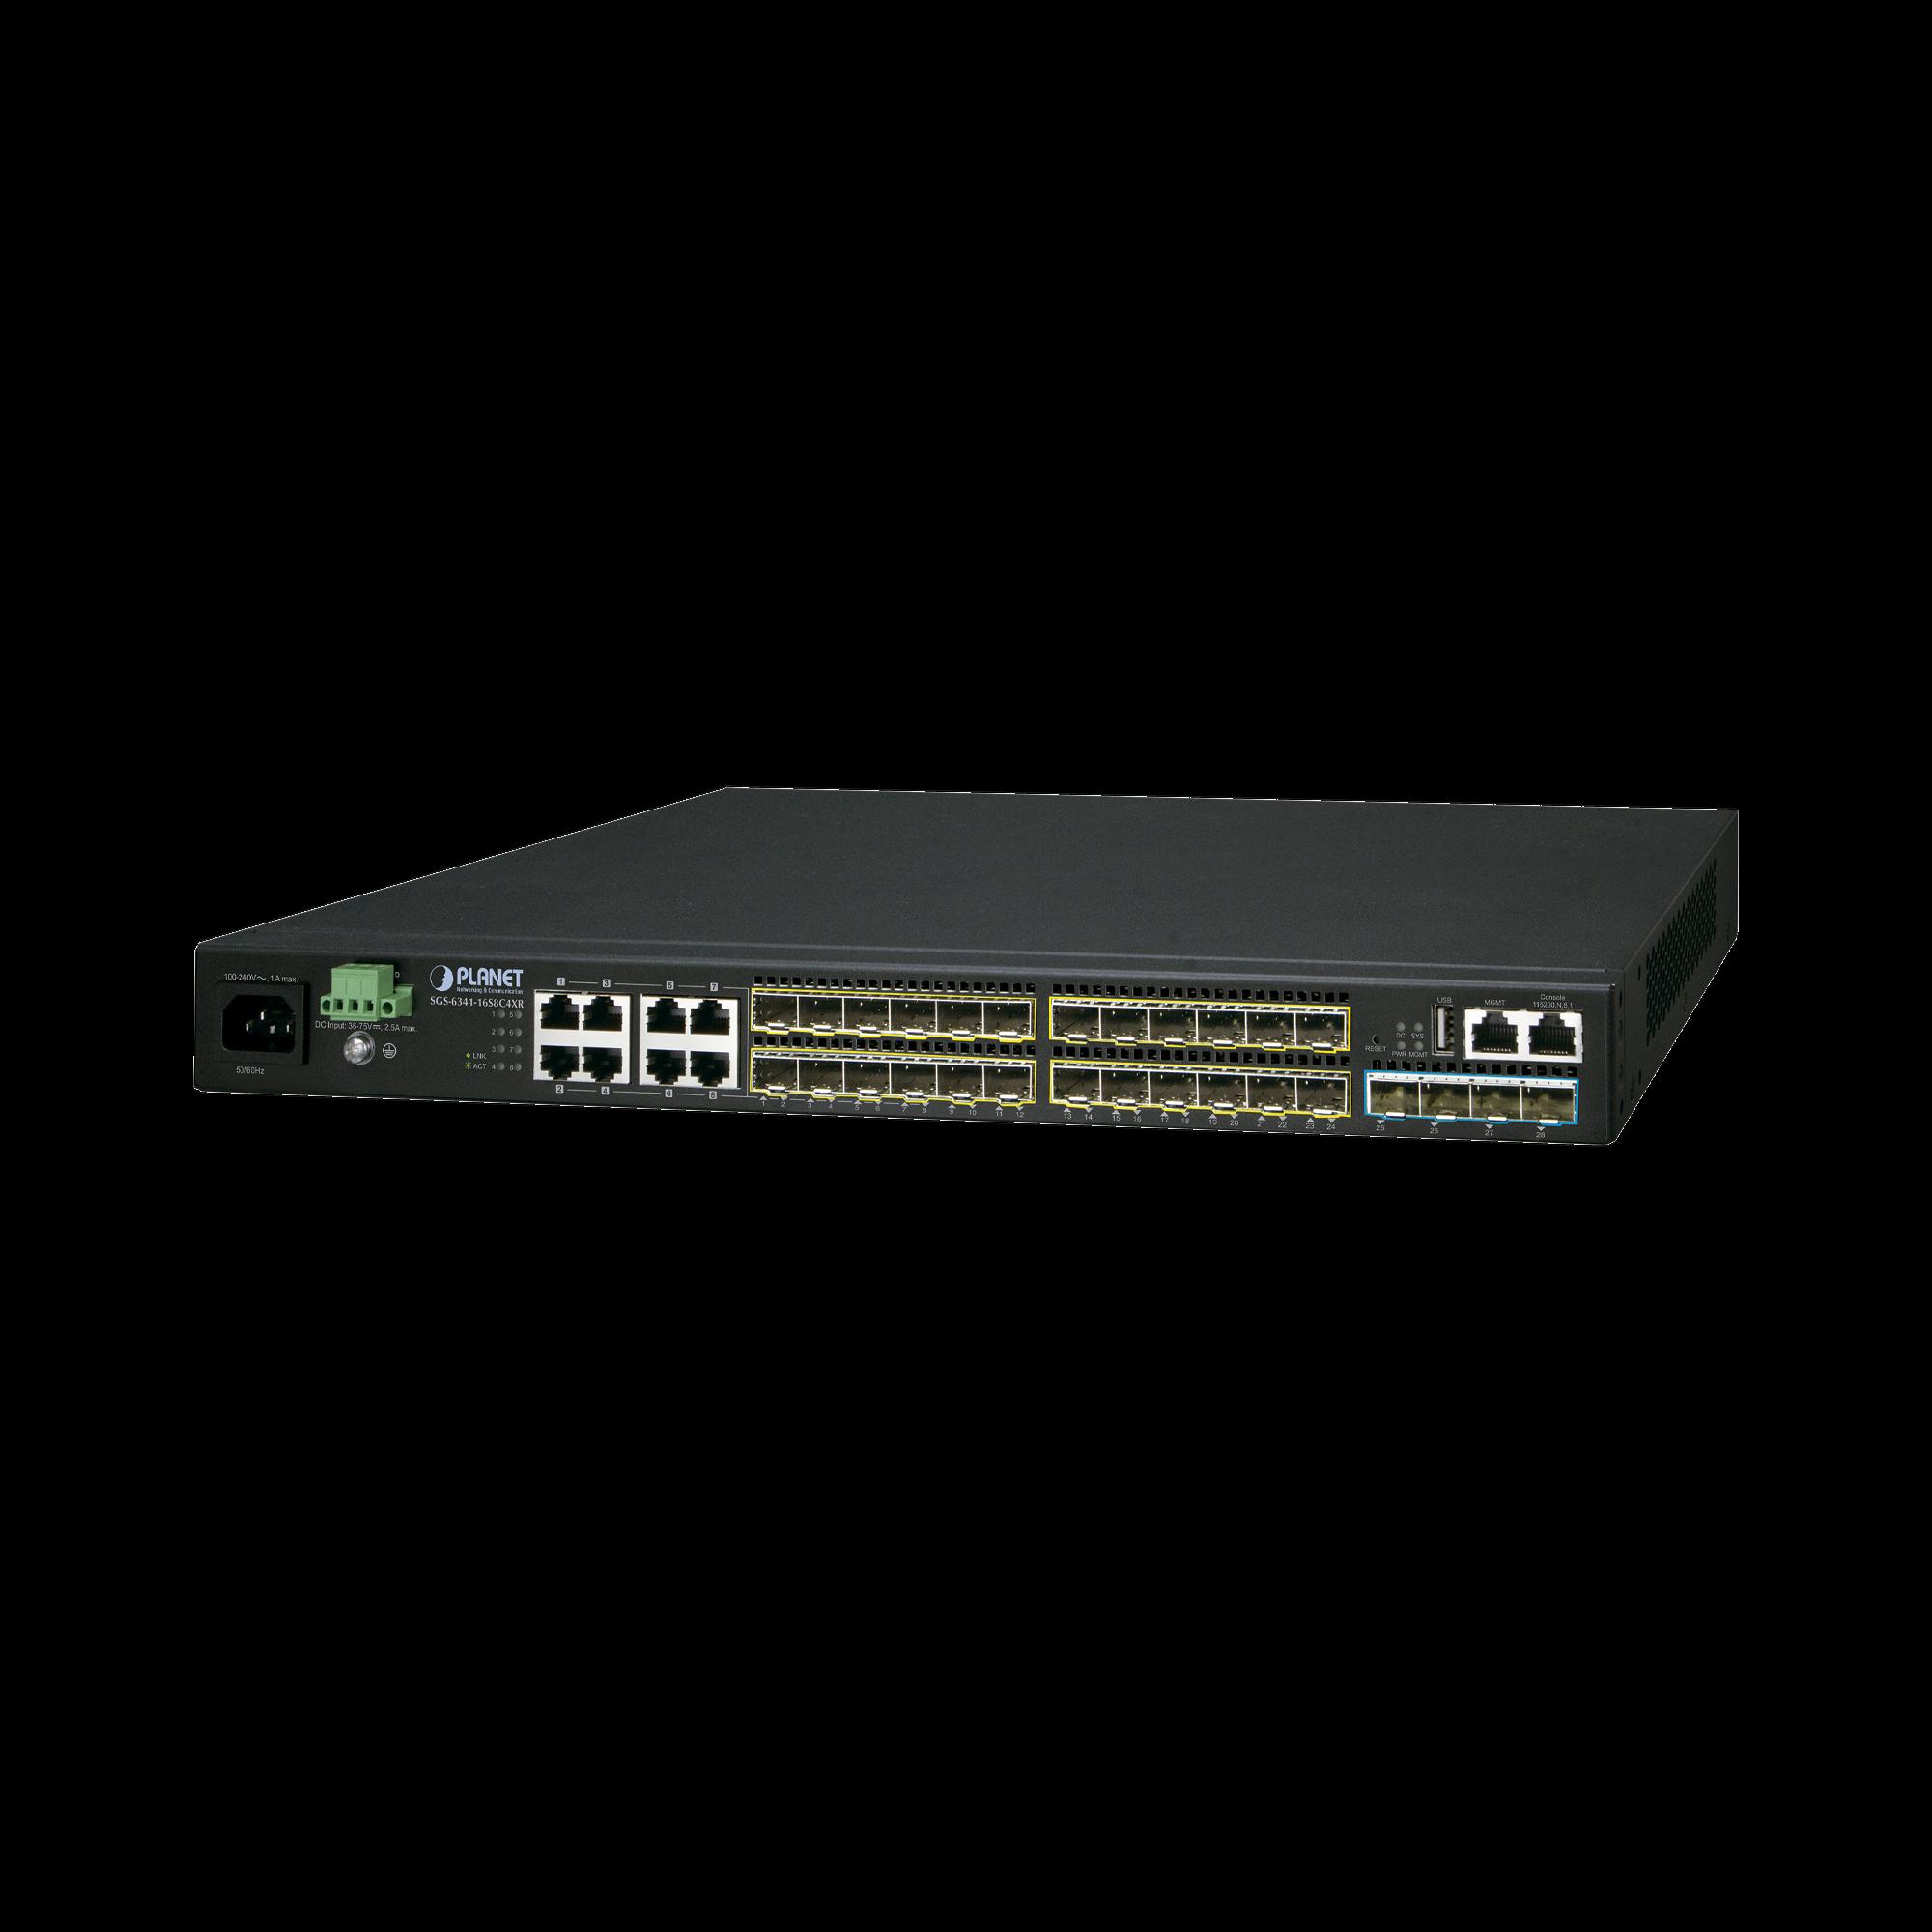 Switch Administrable L3 16-Puertos 100/1000X SFP, 8-Puertos Gigabit TP/SFP, 4-Puertos 10G SFP+ Stackable